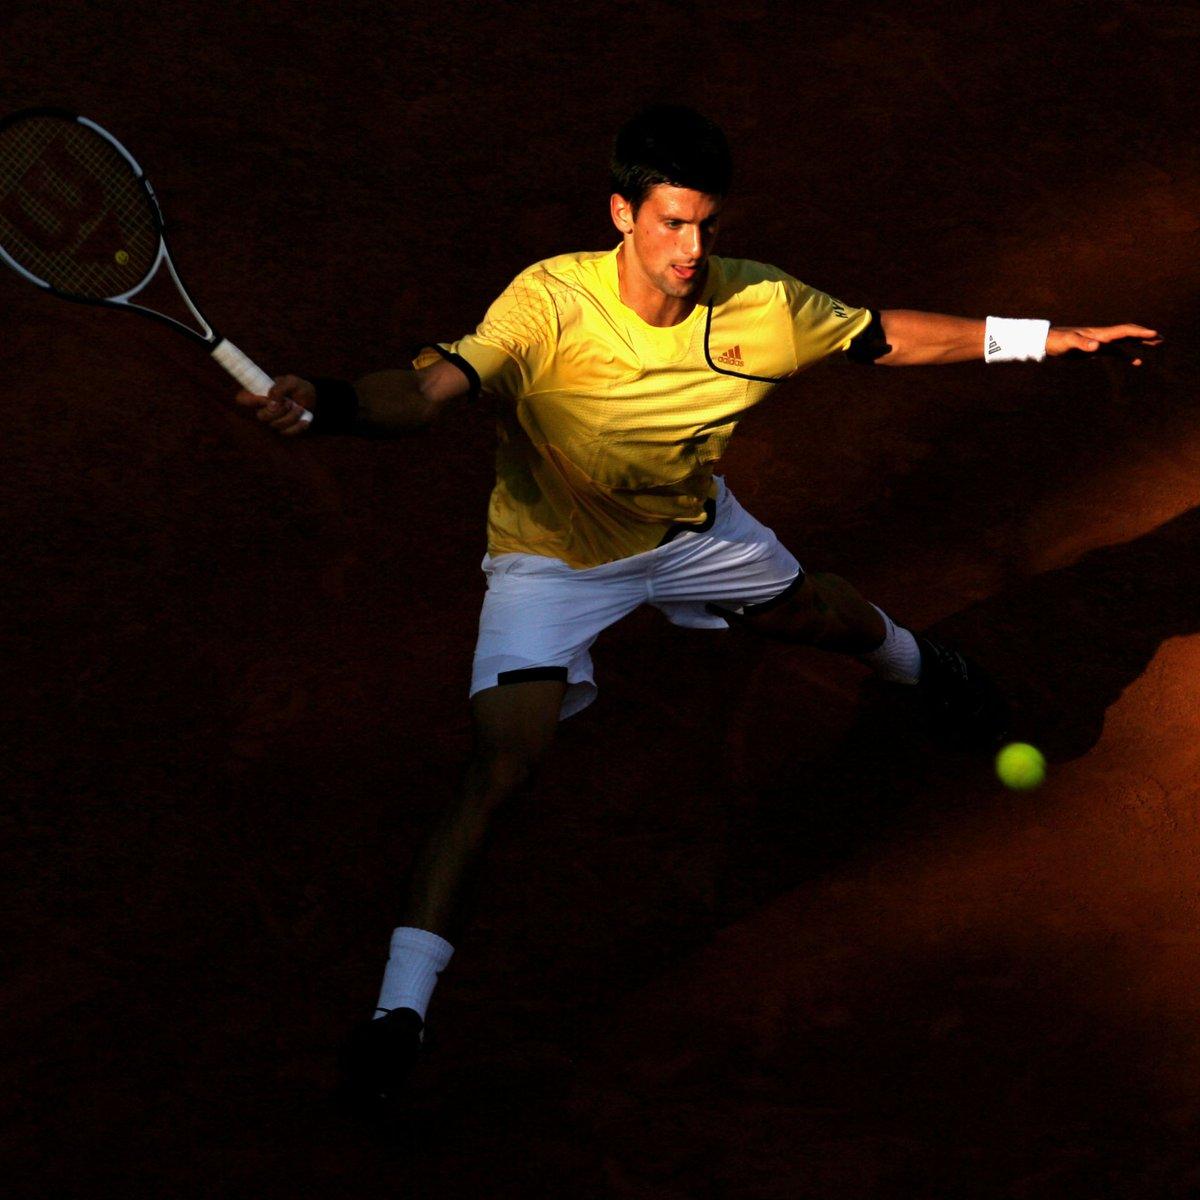 Djokovic 2007 Rome ➡ Djokovic 2020 Rome  Always working for every. single. point. 👏  #IBI20 https://t.co/YpKkykdniM